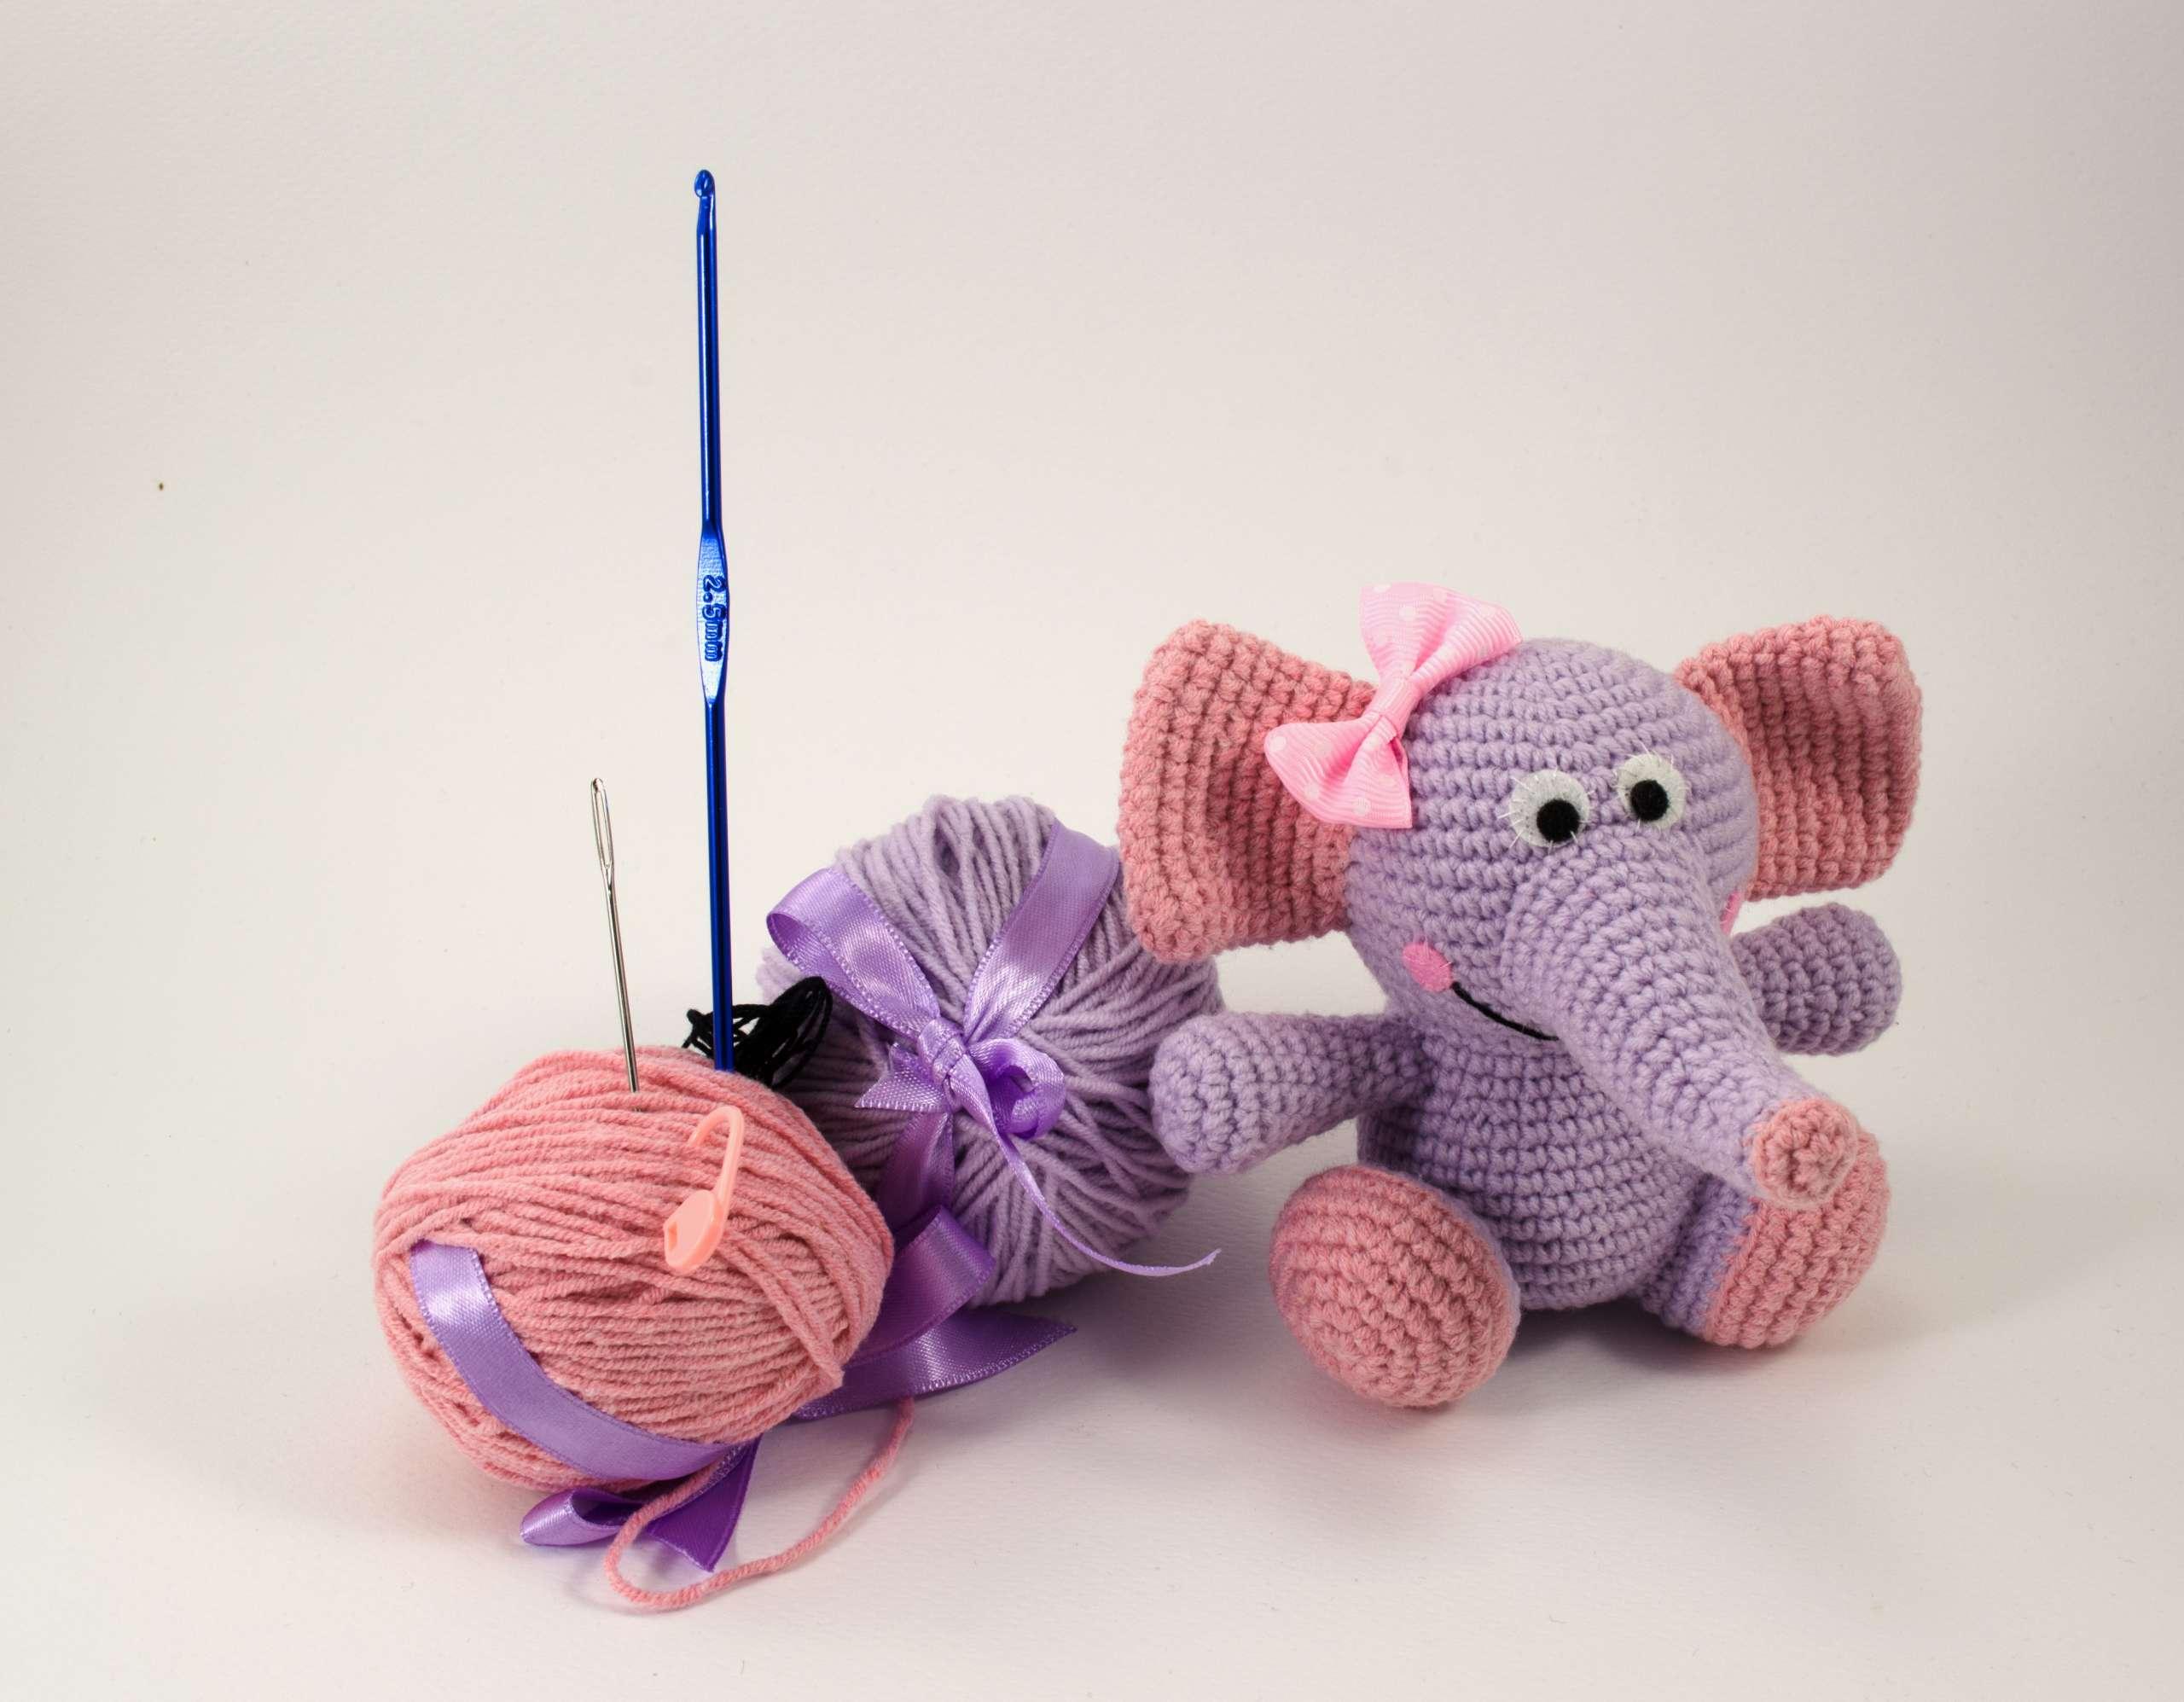 crochet purple elephant diy kit